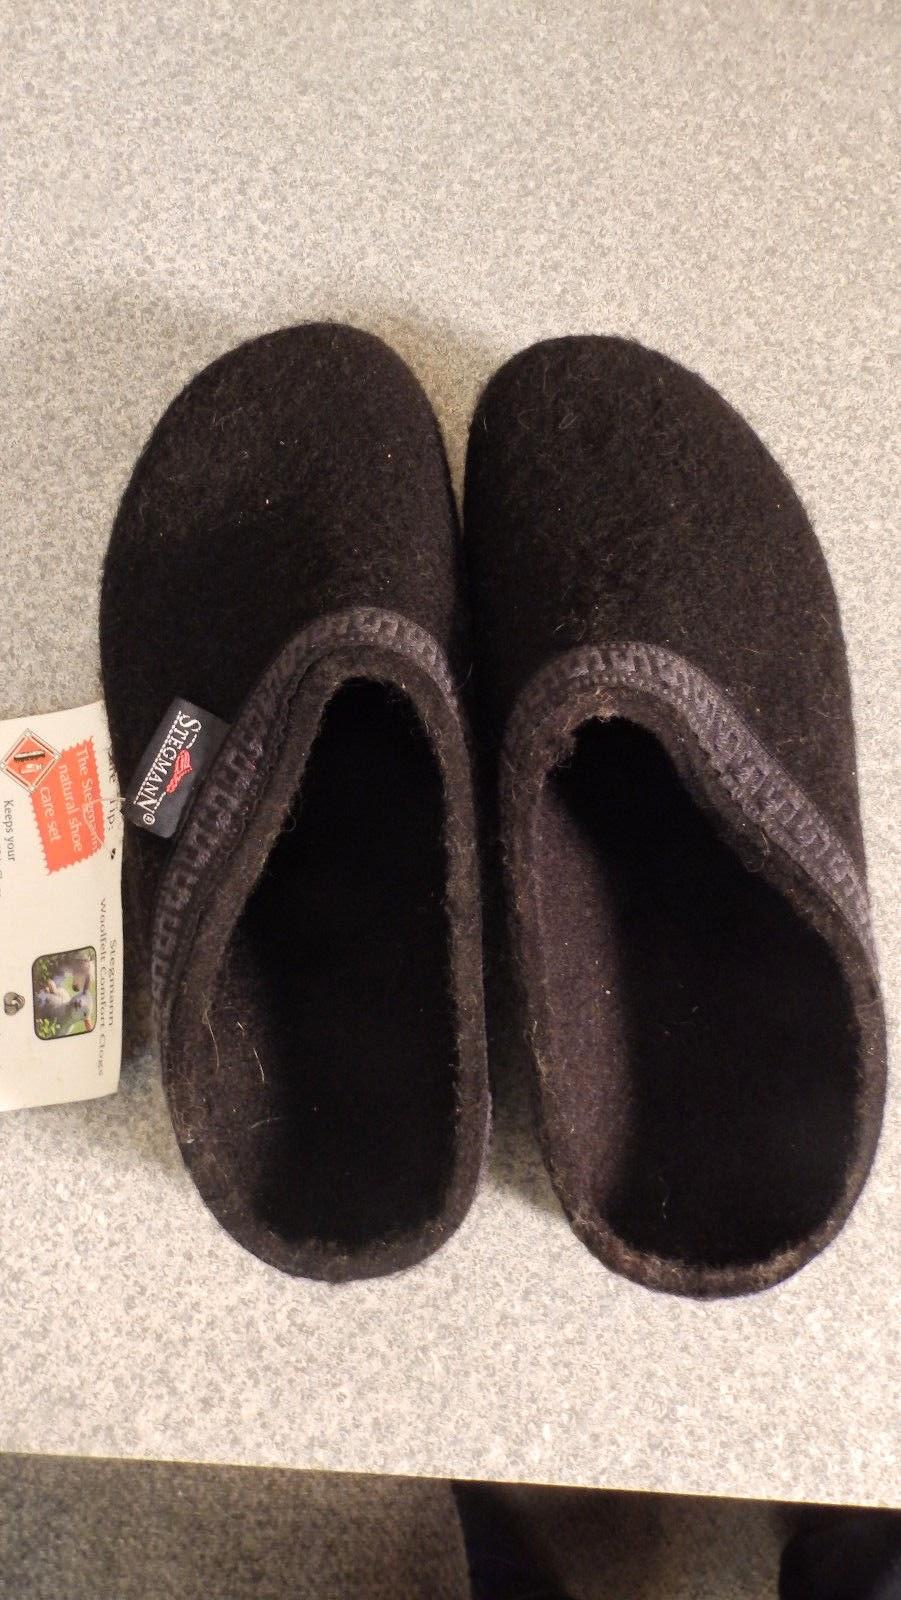 http://www.ebay.com/itm/Stegmann-wool-felt-clogs-size-7-1-2-black-never-worn-/321690391301?pt=LH_DefaultDomain_0&hash=item4ae63dd305